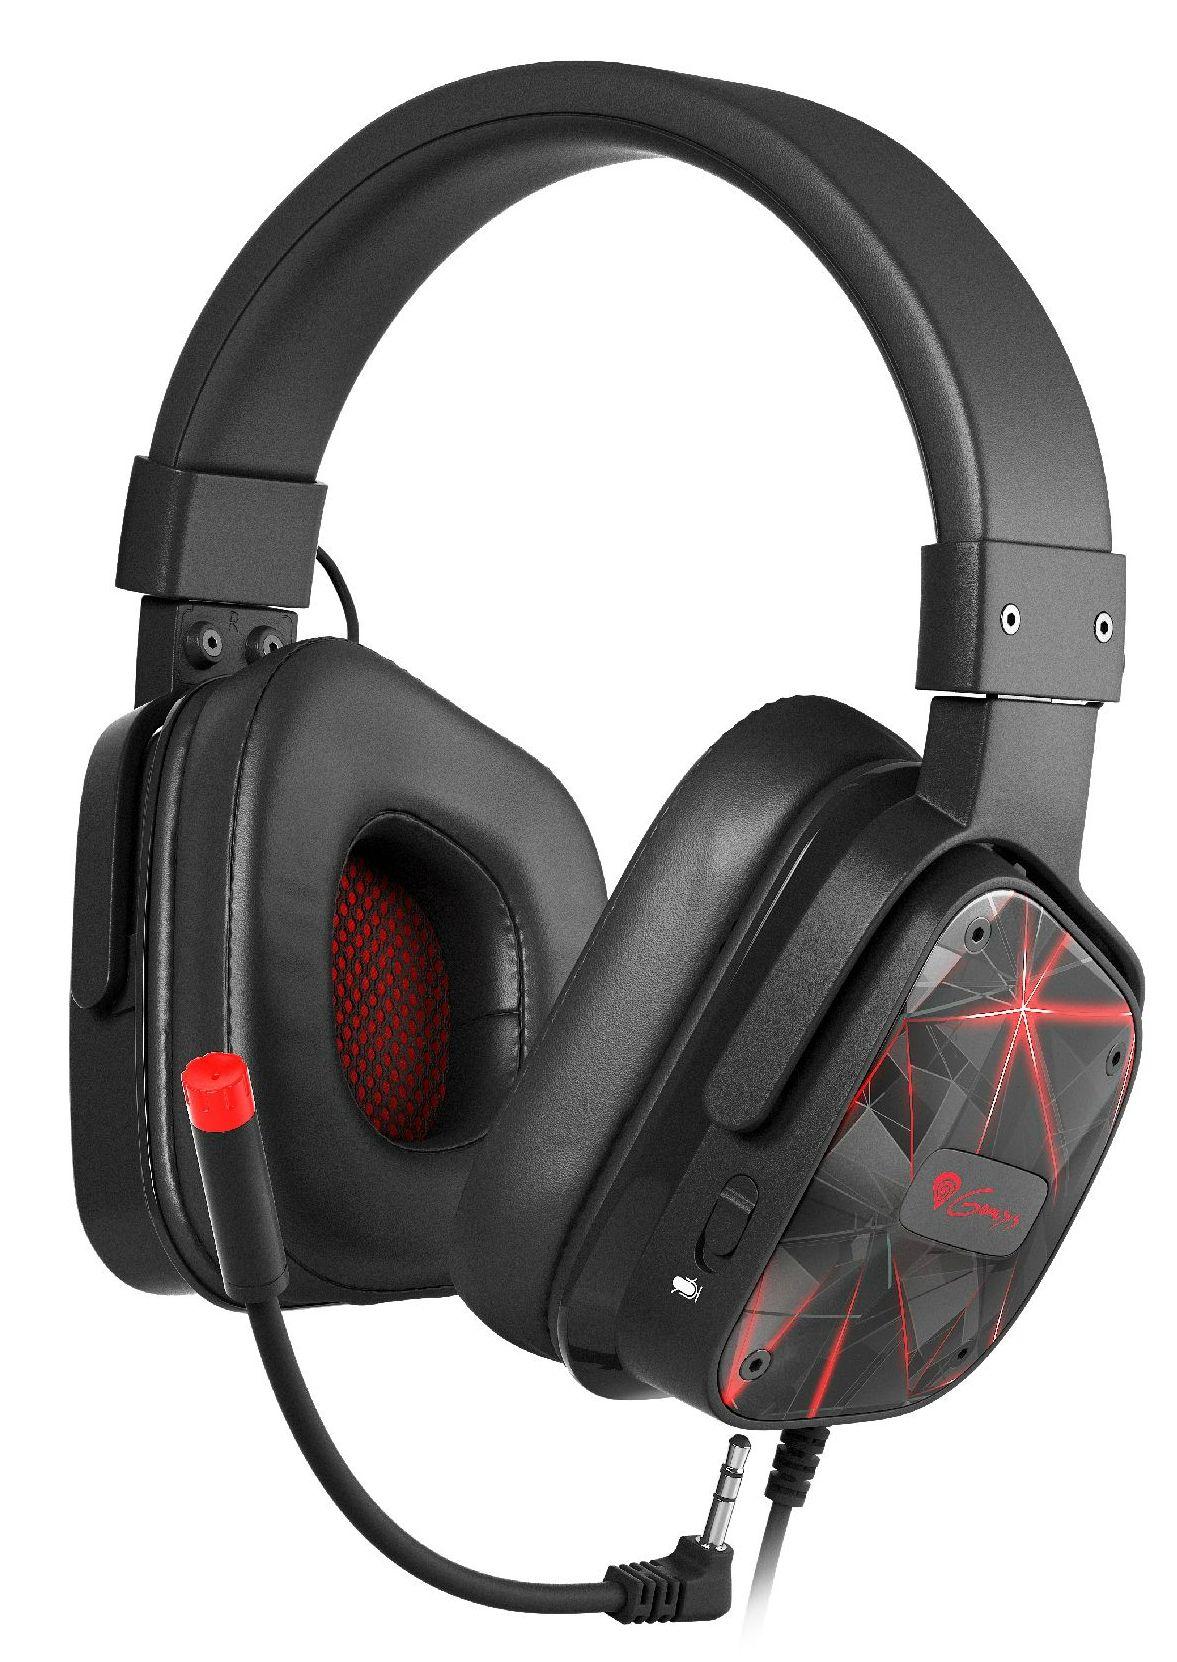 Гейминг слушалки с микрофон Genesis - Argon 570, черни - 1